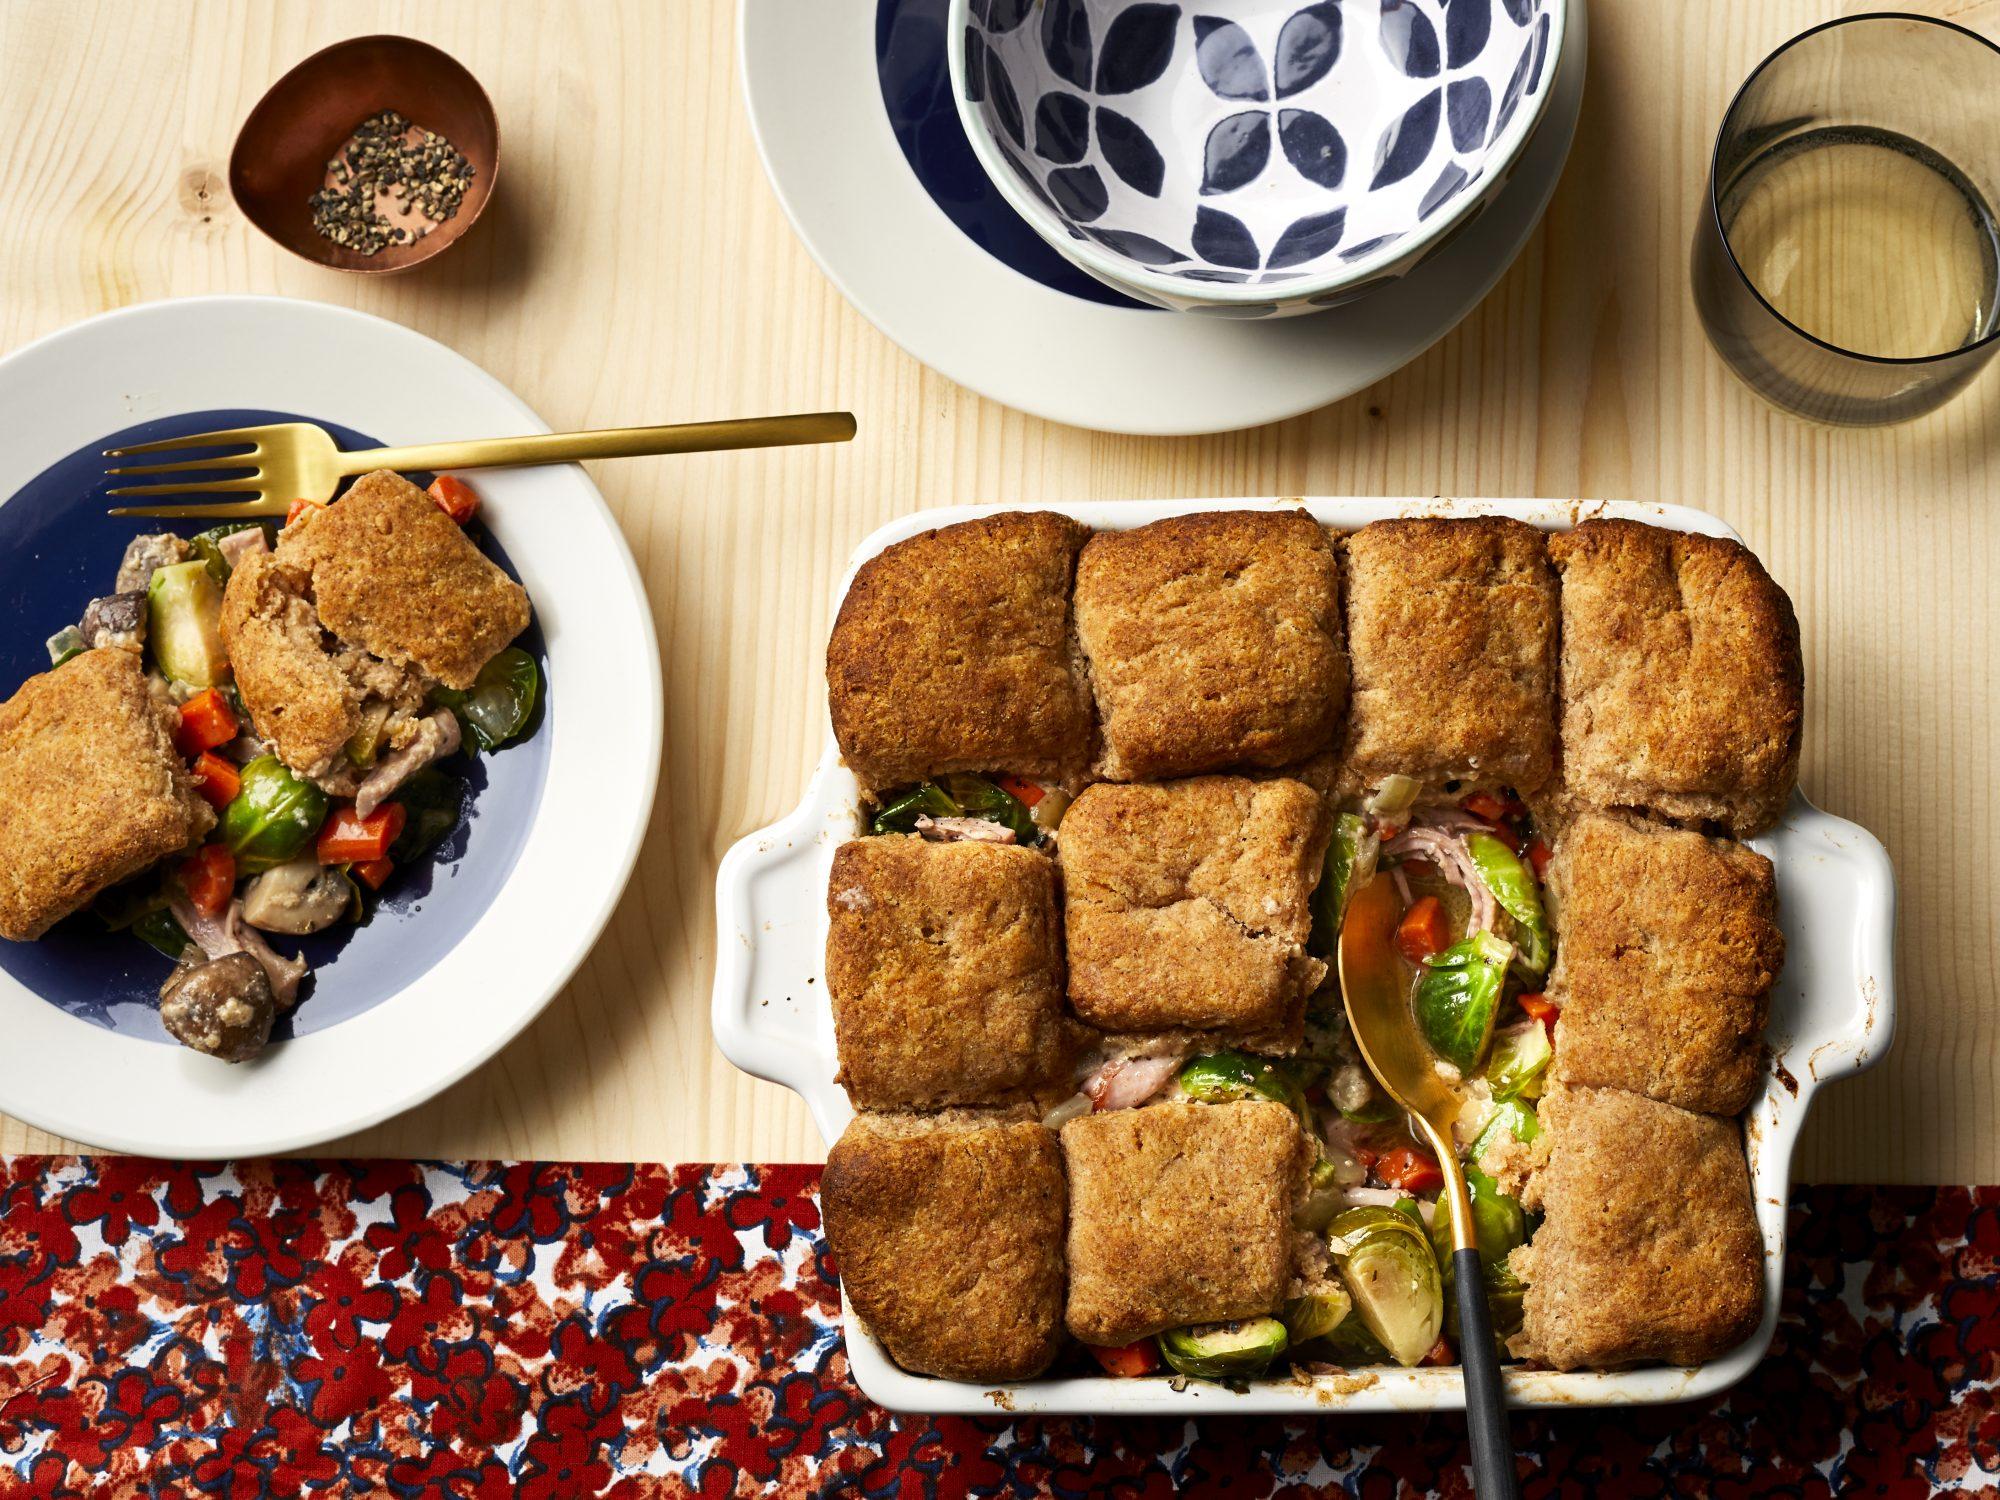 mr-Hearty TurkeyPot Pie with Spelt Biscuits Image